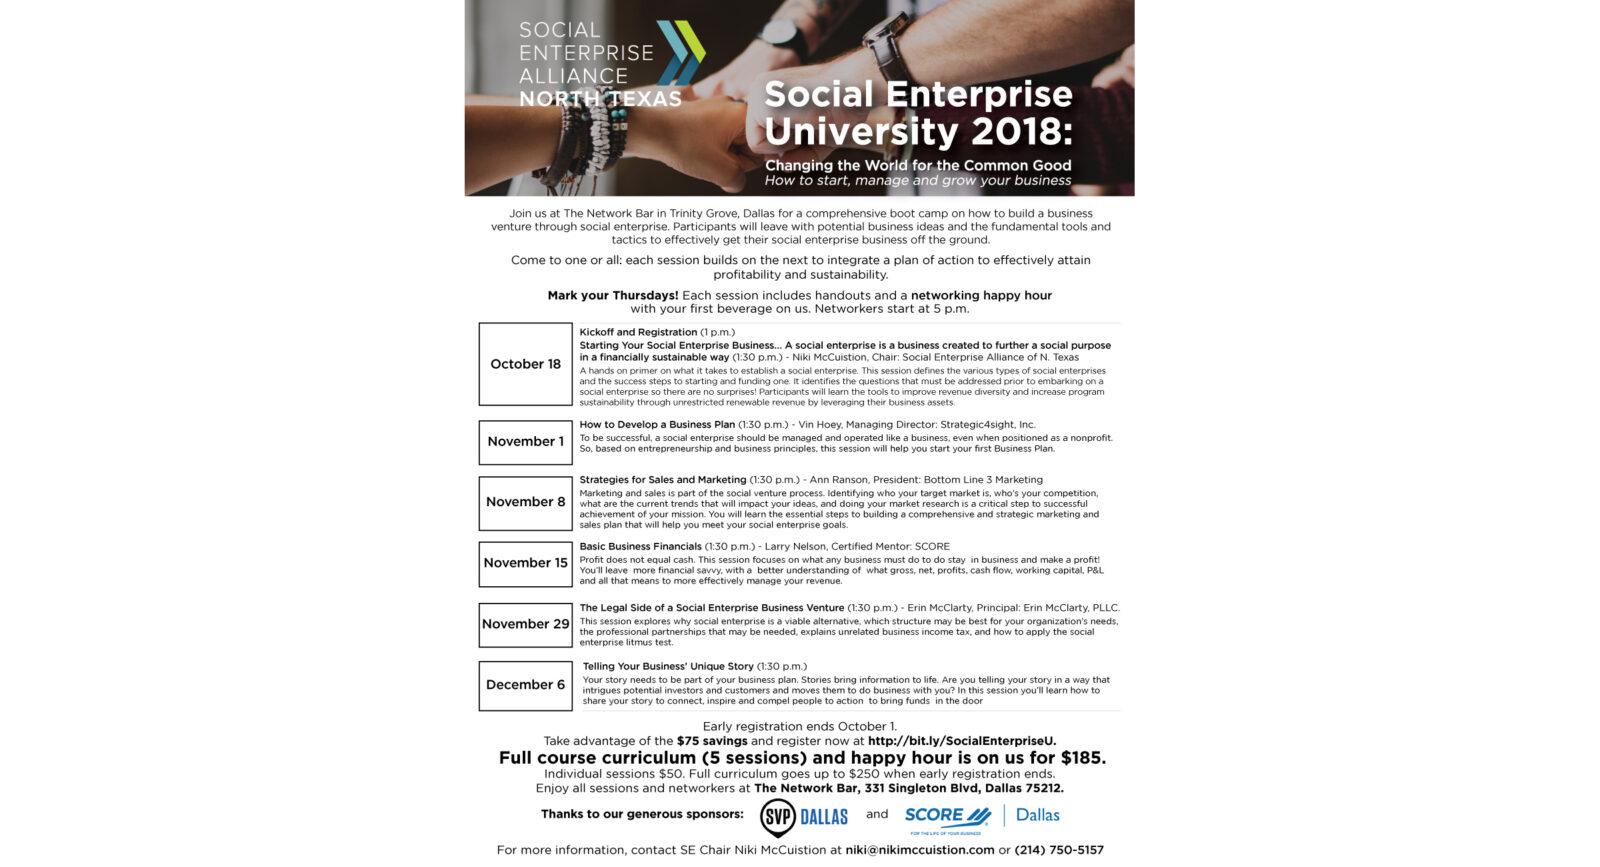 Social Enterprise University flier